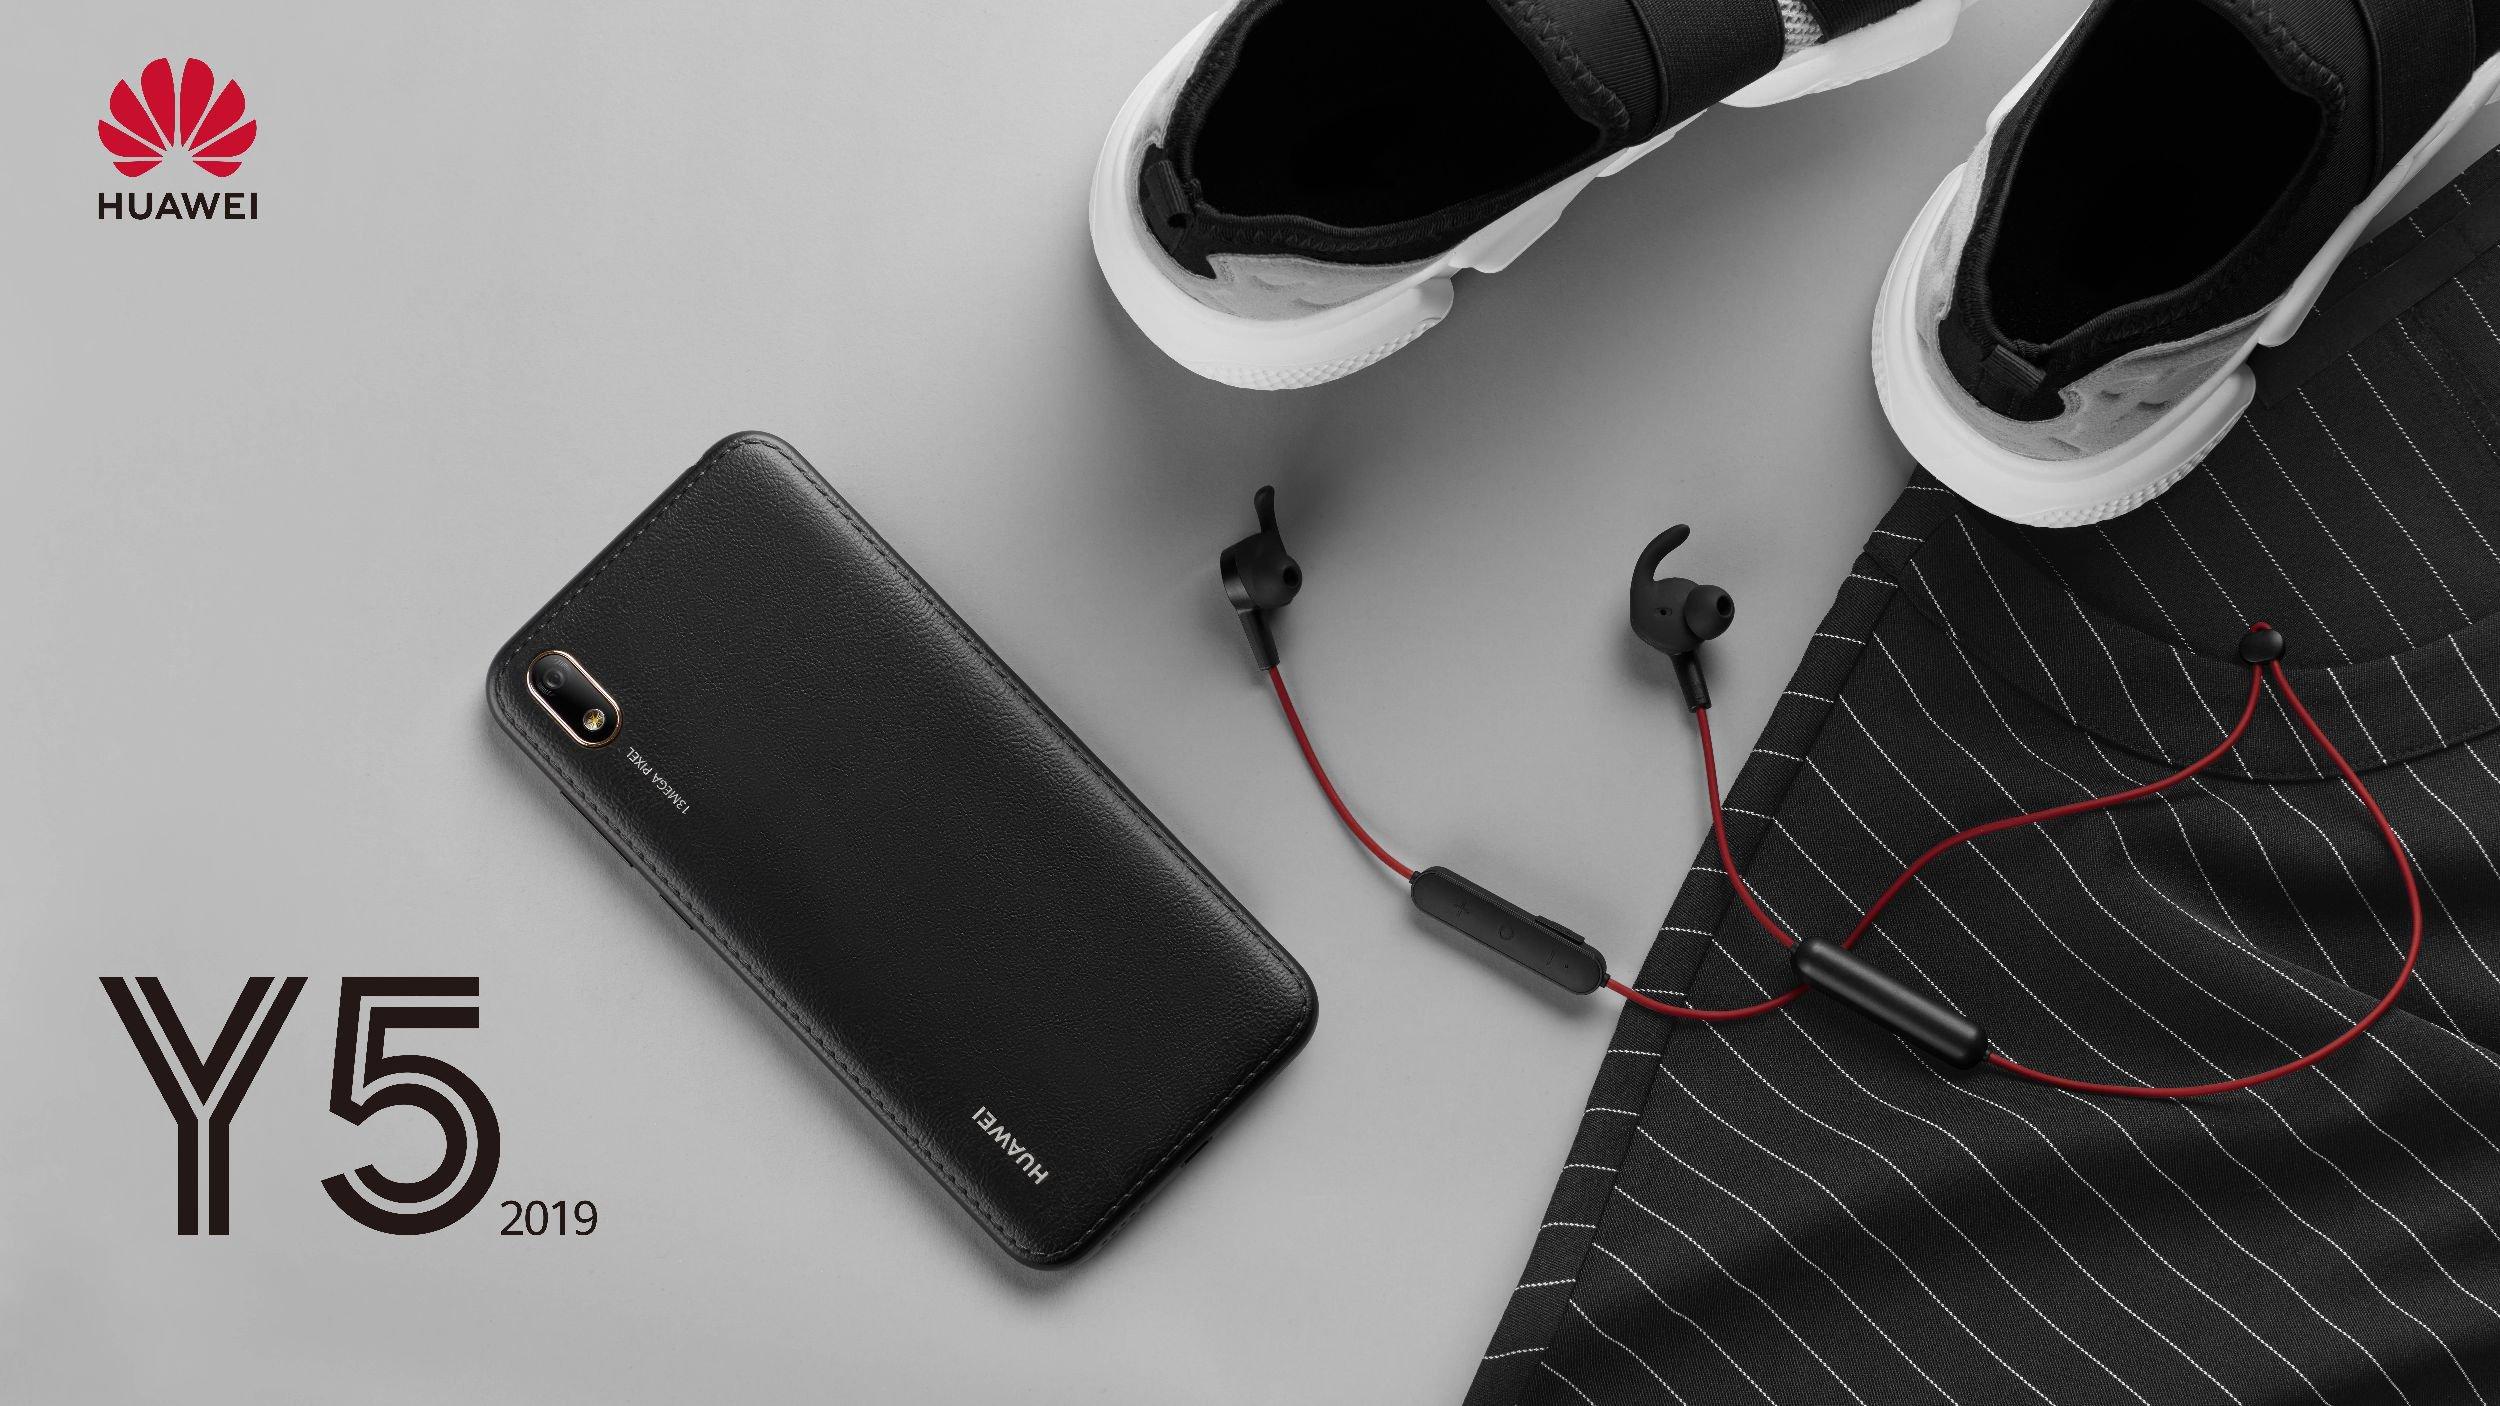 SMARTFON Huawei Y5 2019 black